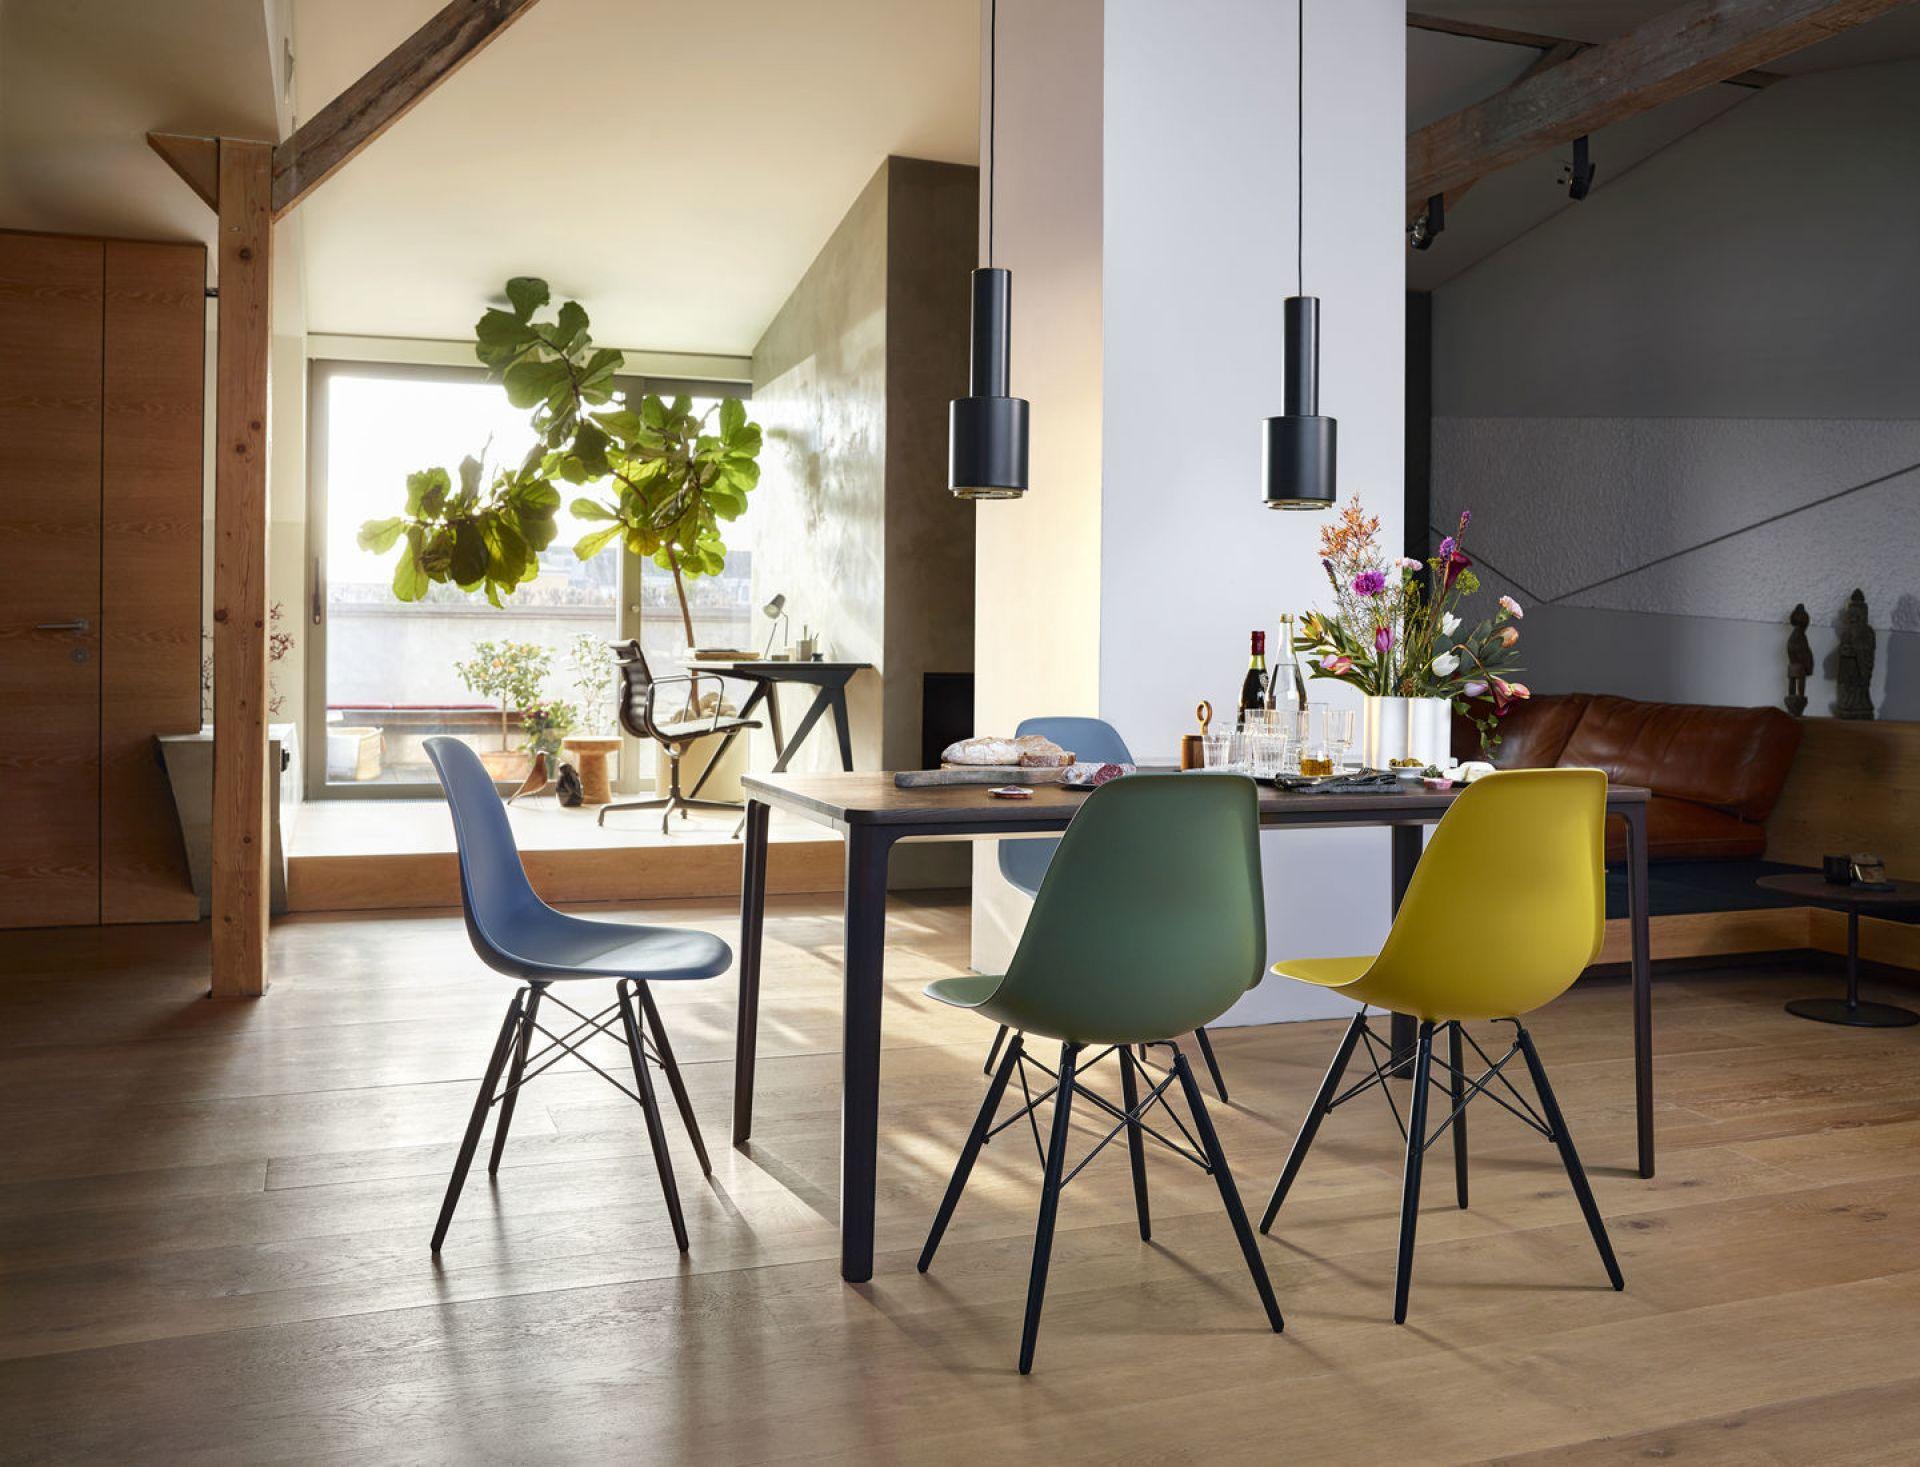 Eames Plastic Side Chair Dsw Stuhl Vitra Ahorn Dunkel Grun Vitra 44030500 95 42